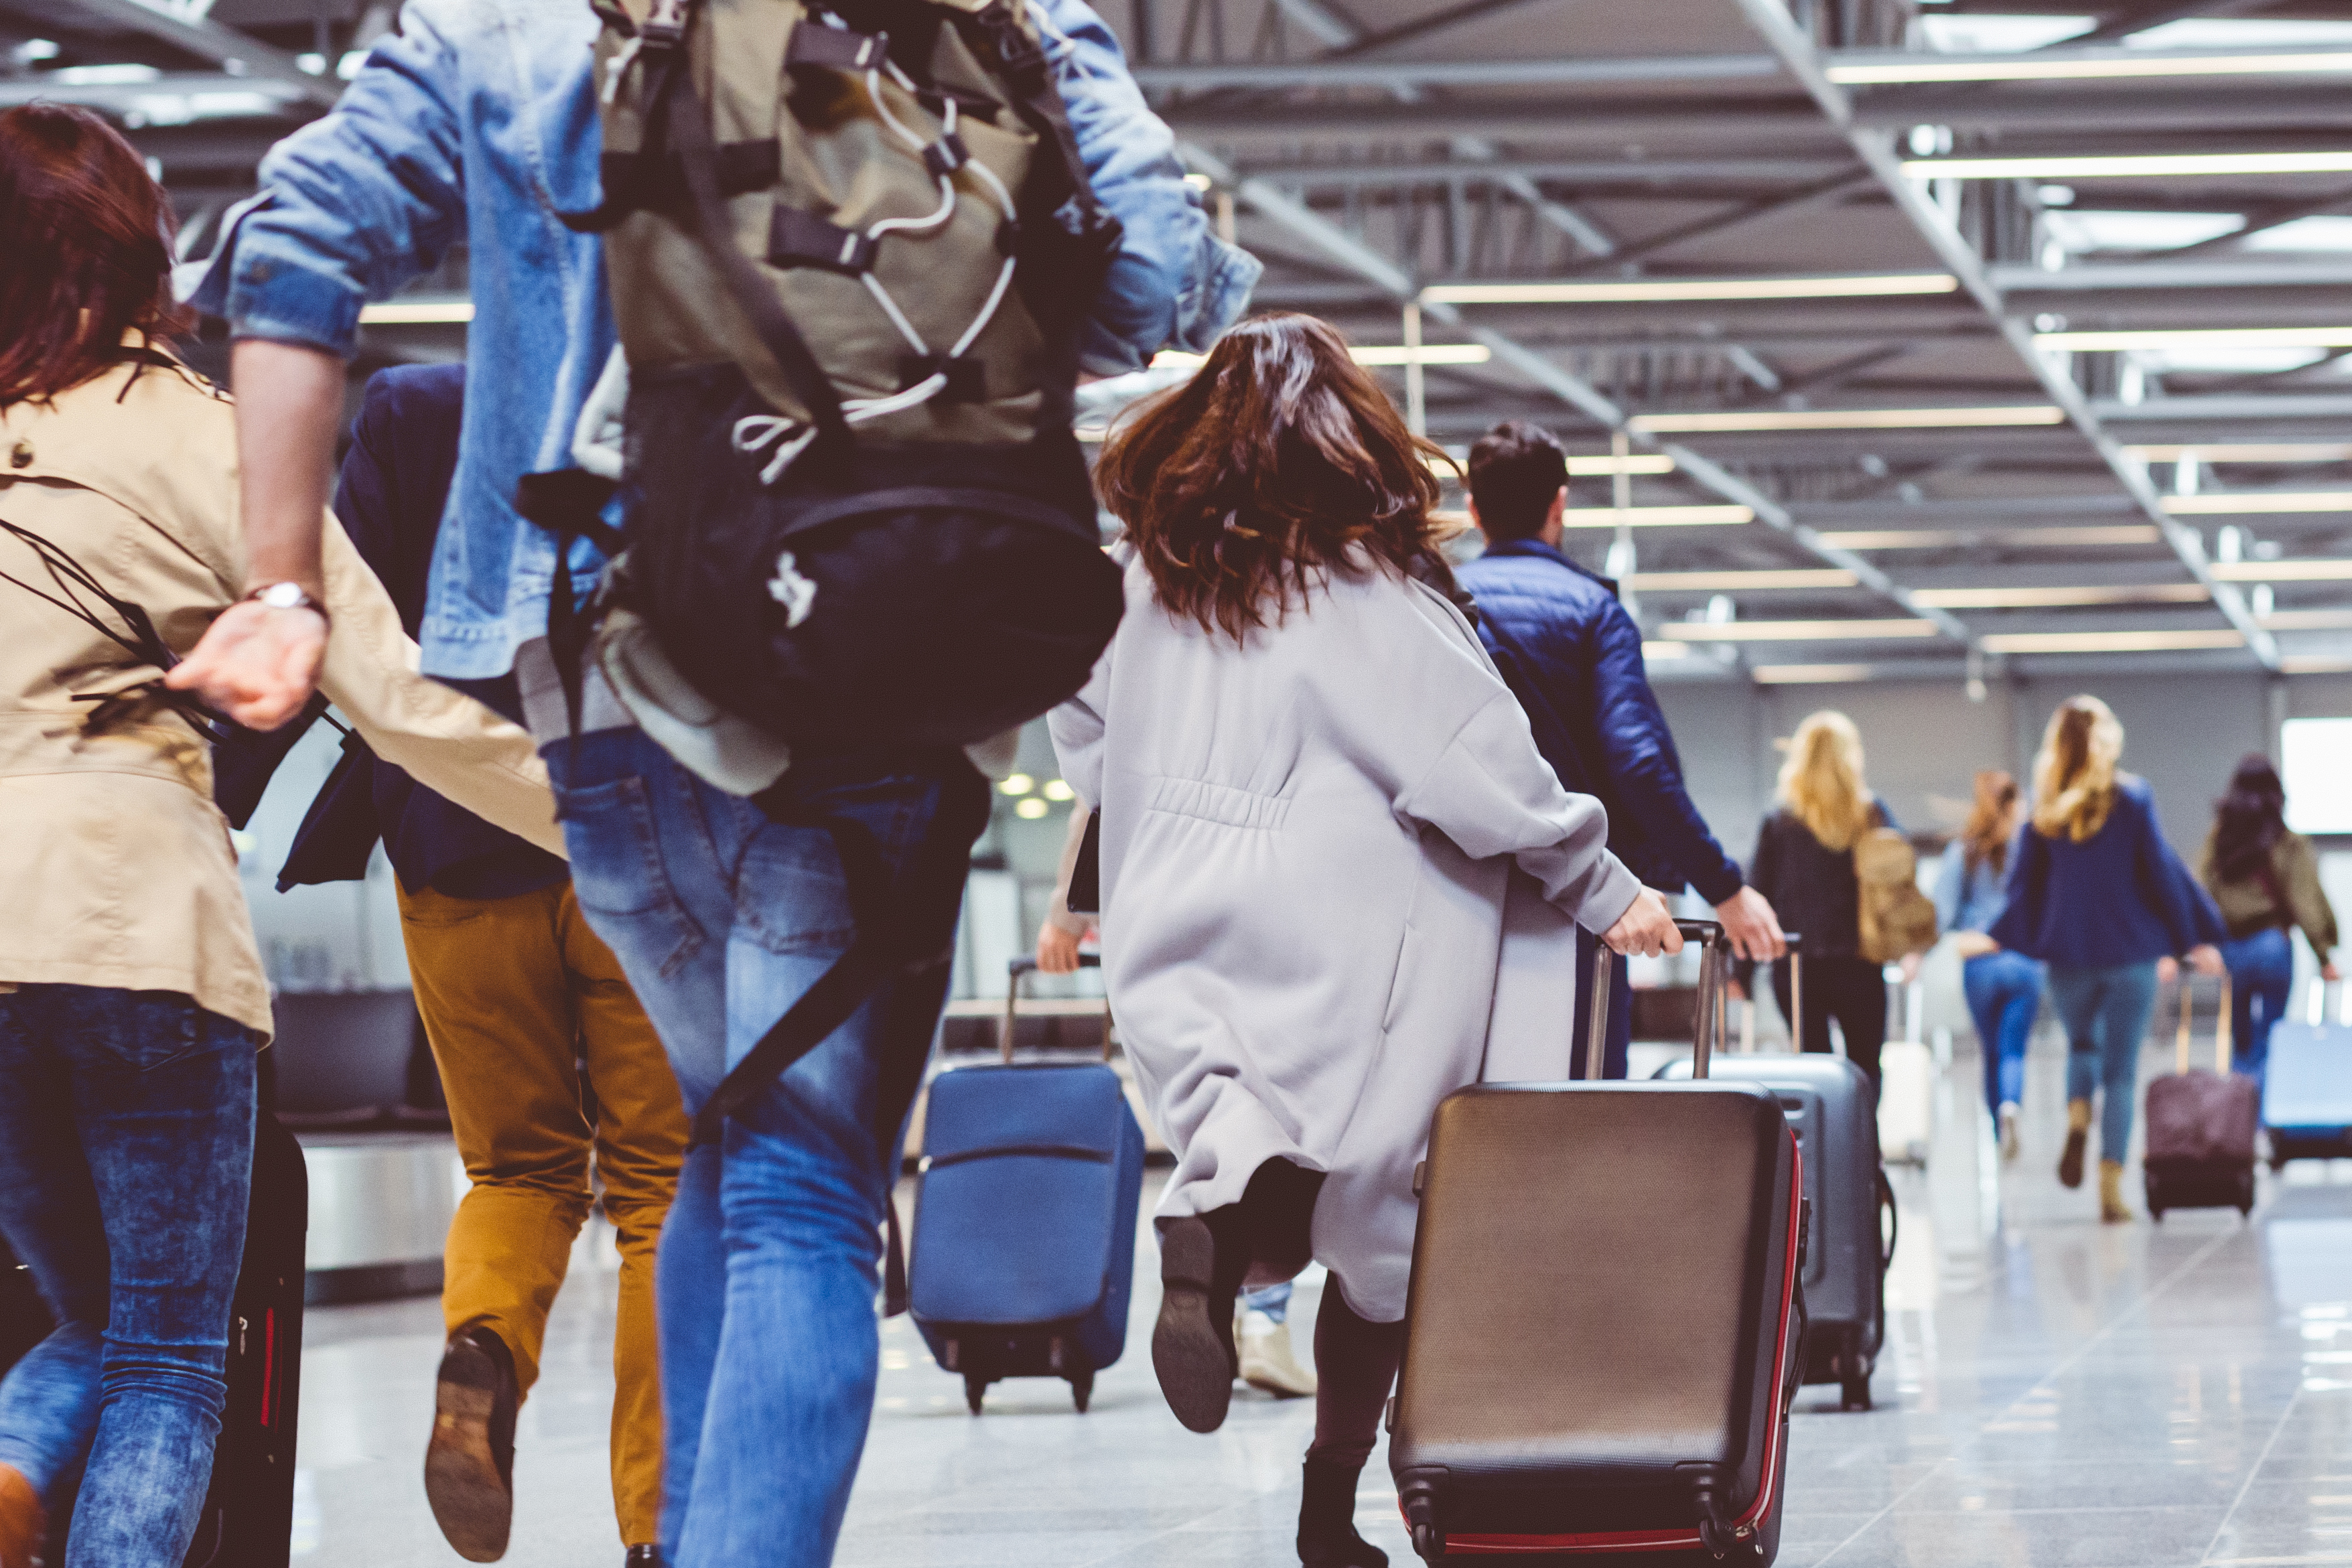 Woman in grey coat running through airport